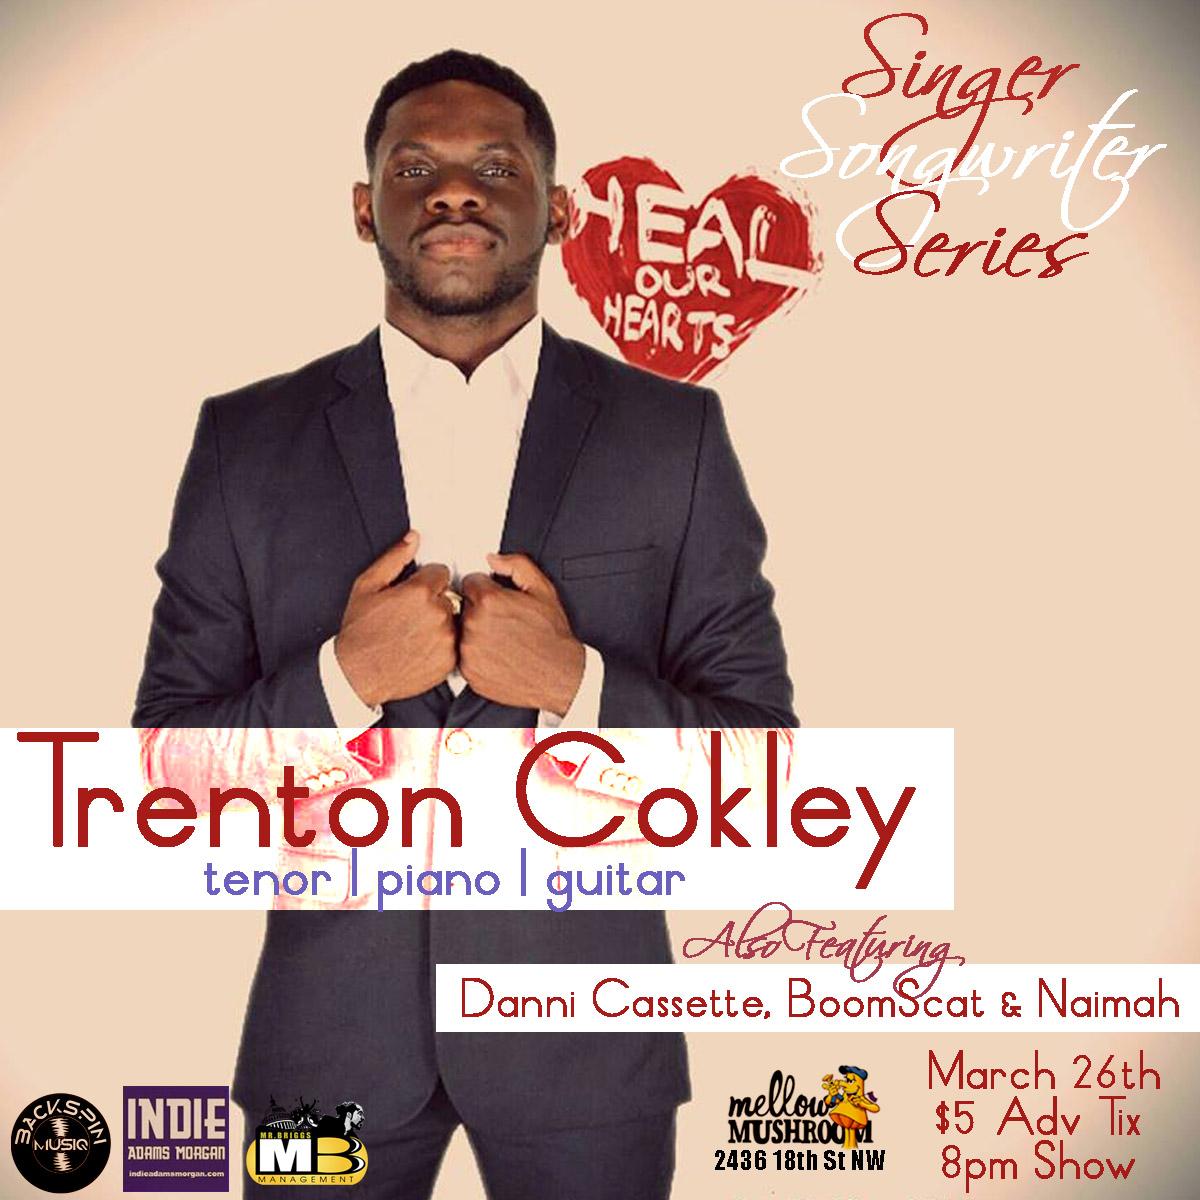 Trenton Cokley for Singer/Songwriter Series: Adams Morgan